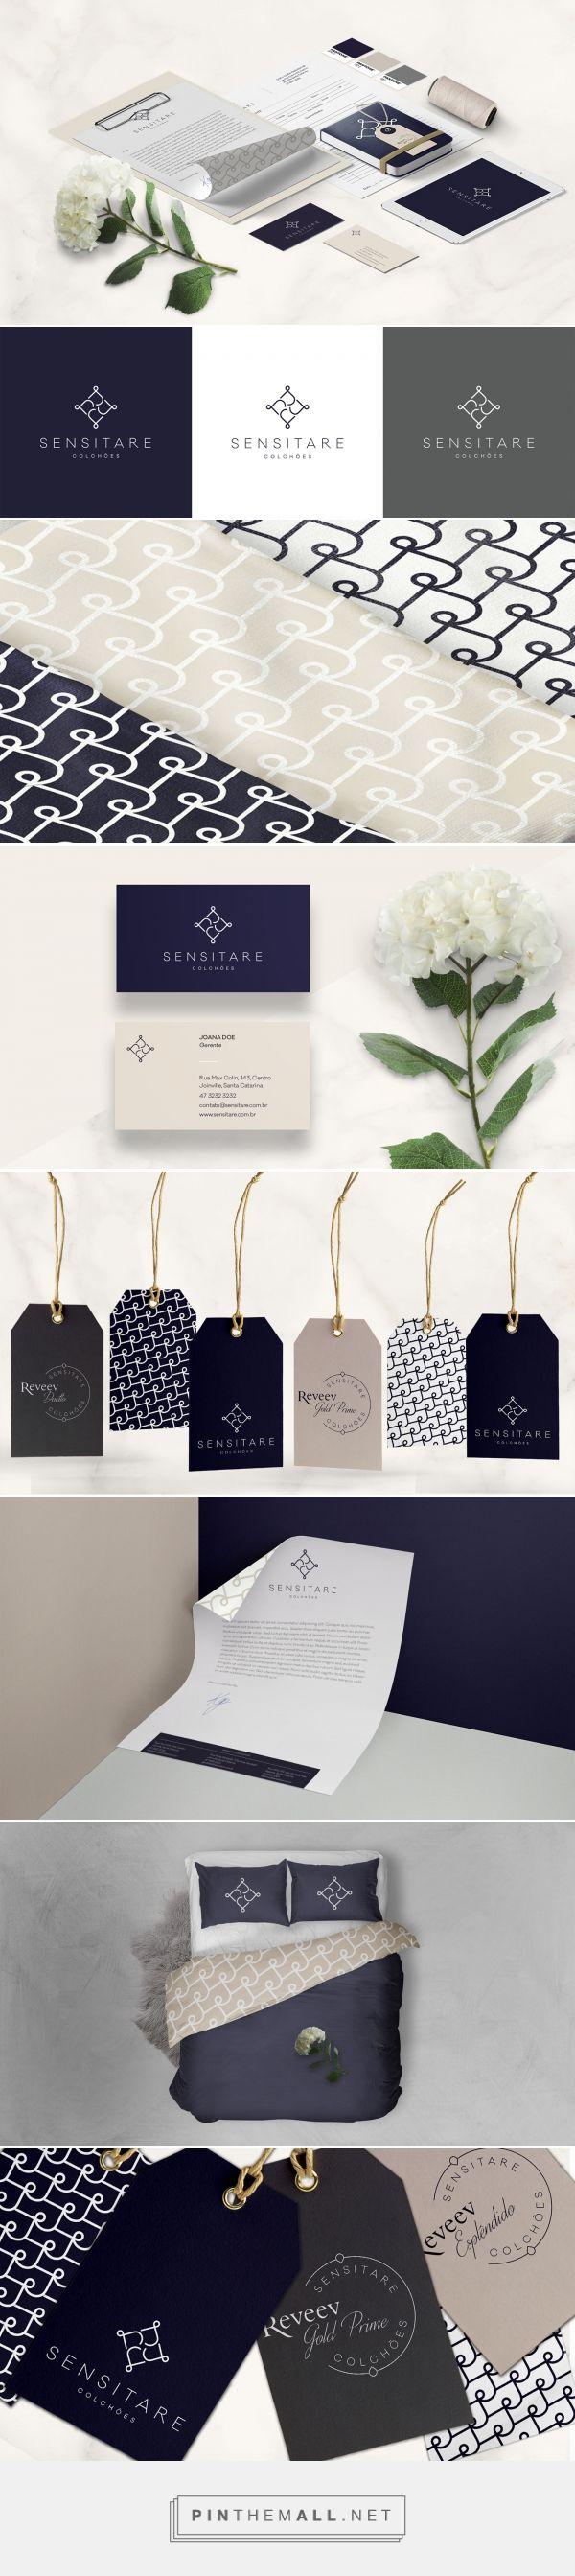 T-shirt design zeixs - Sensitare Mattress Company Branding By Taina Ribovski